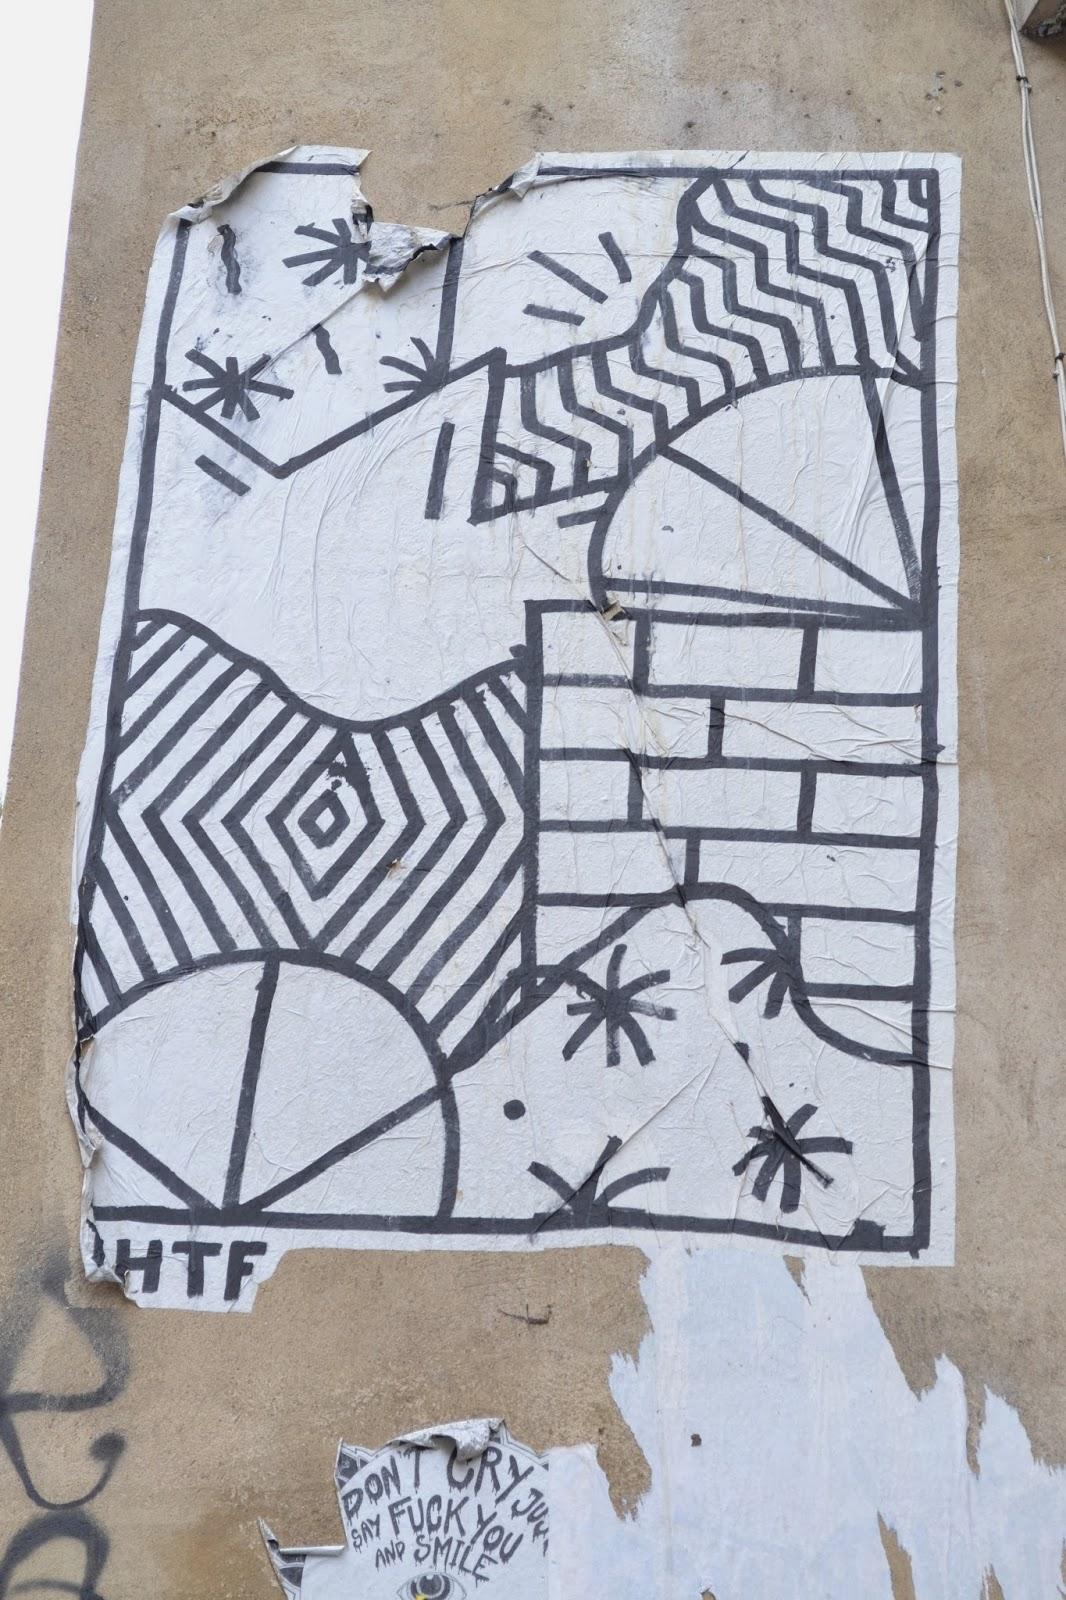 Street art Lyon Croix Rousse Terreaux THTF Birdy Kids Kesa Esem Agrume graffiti tag